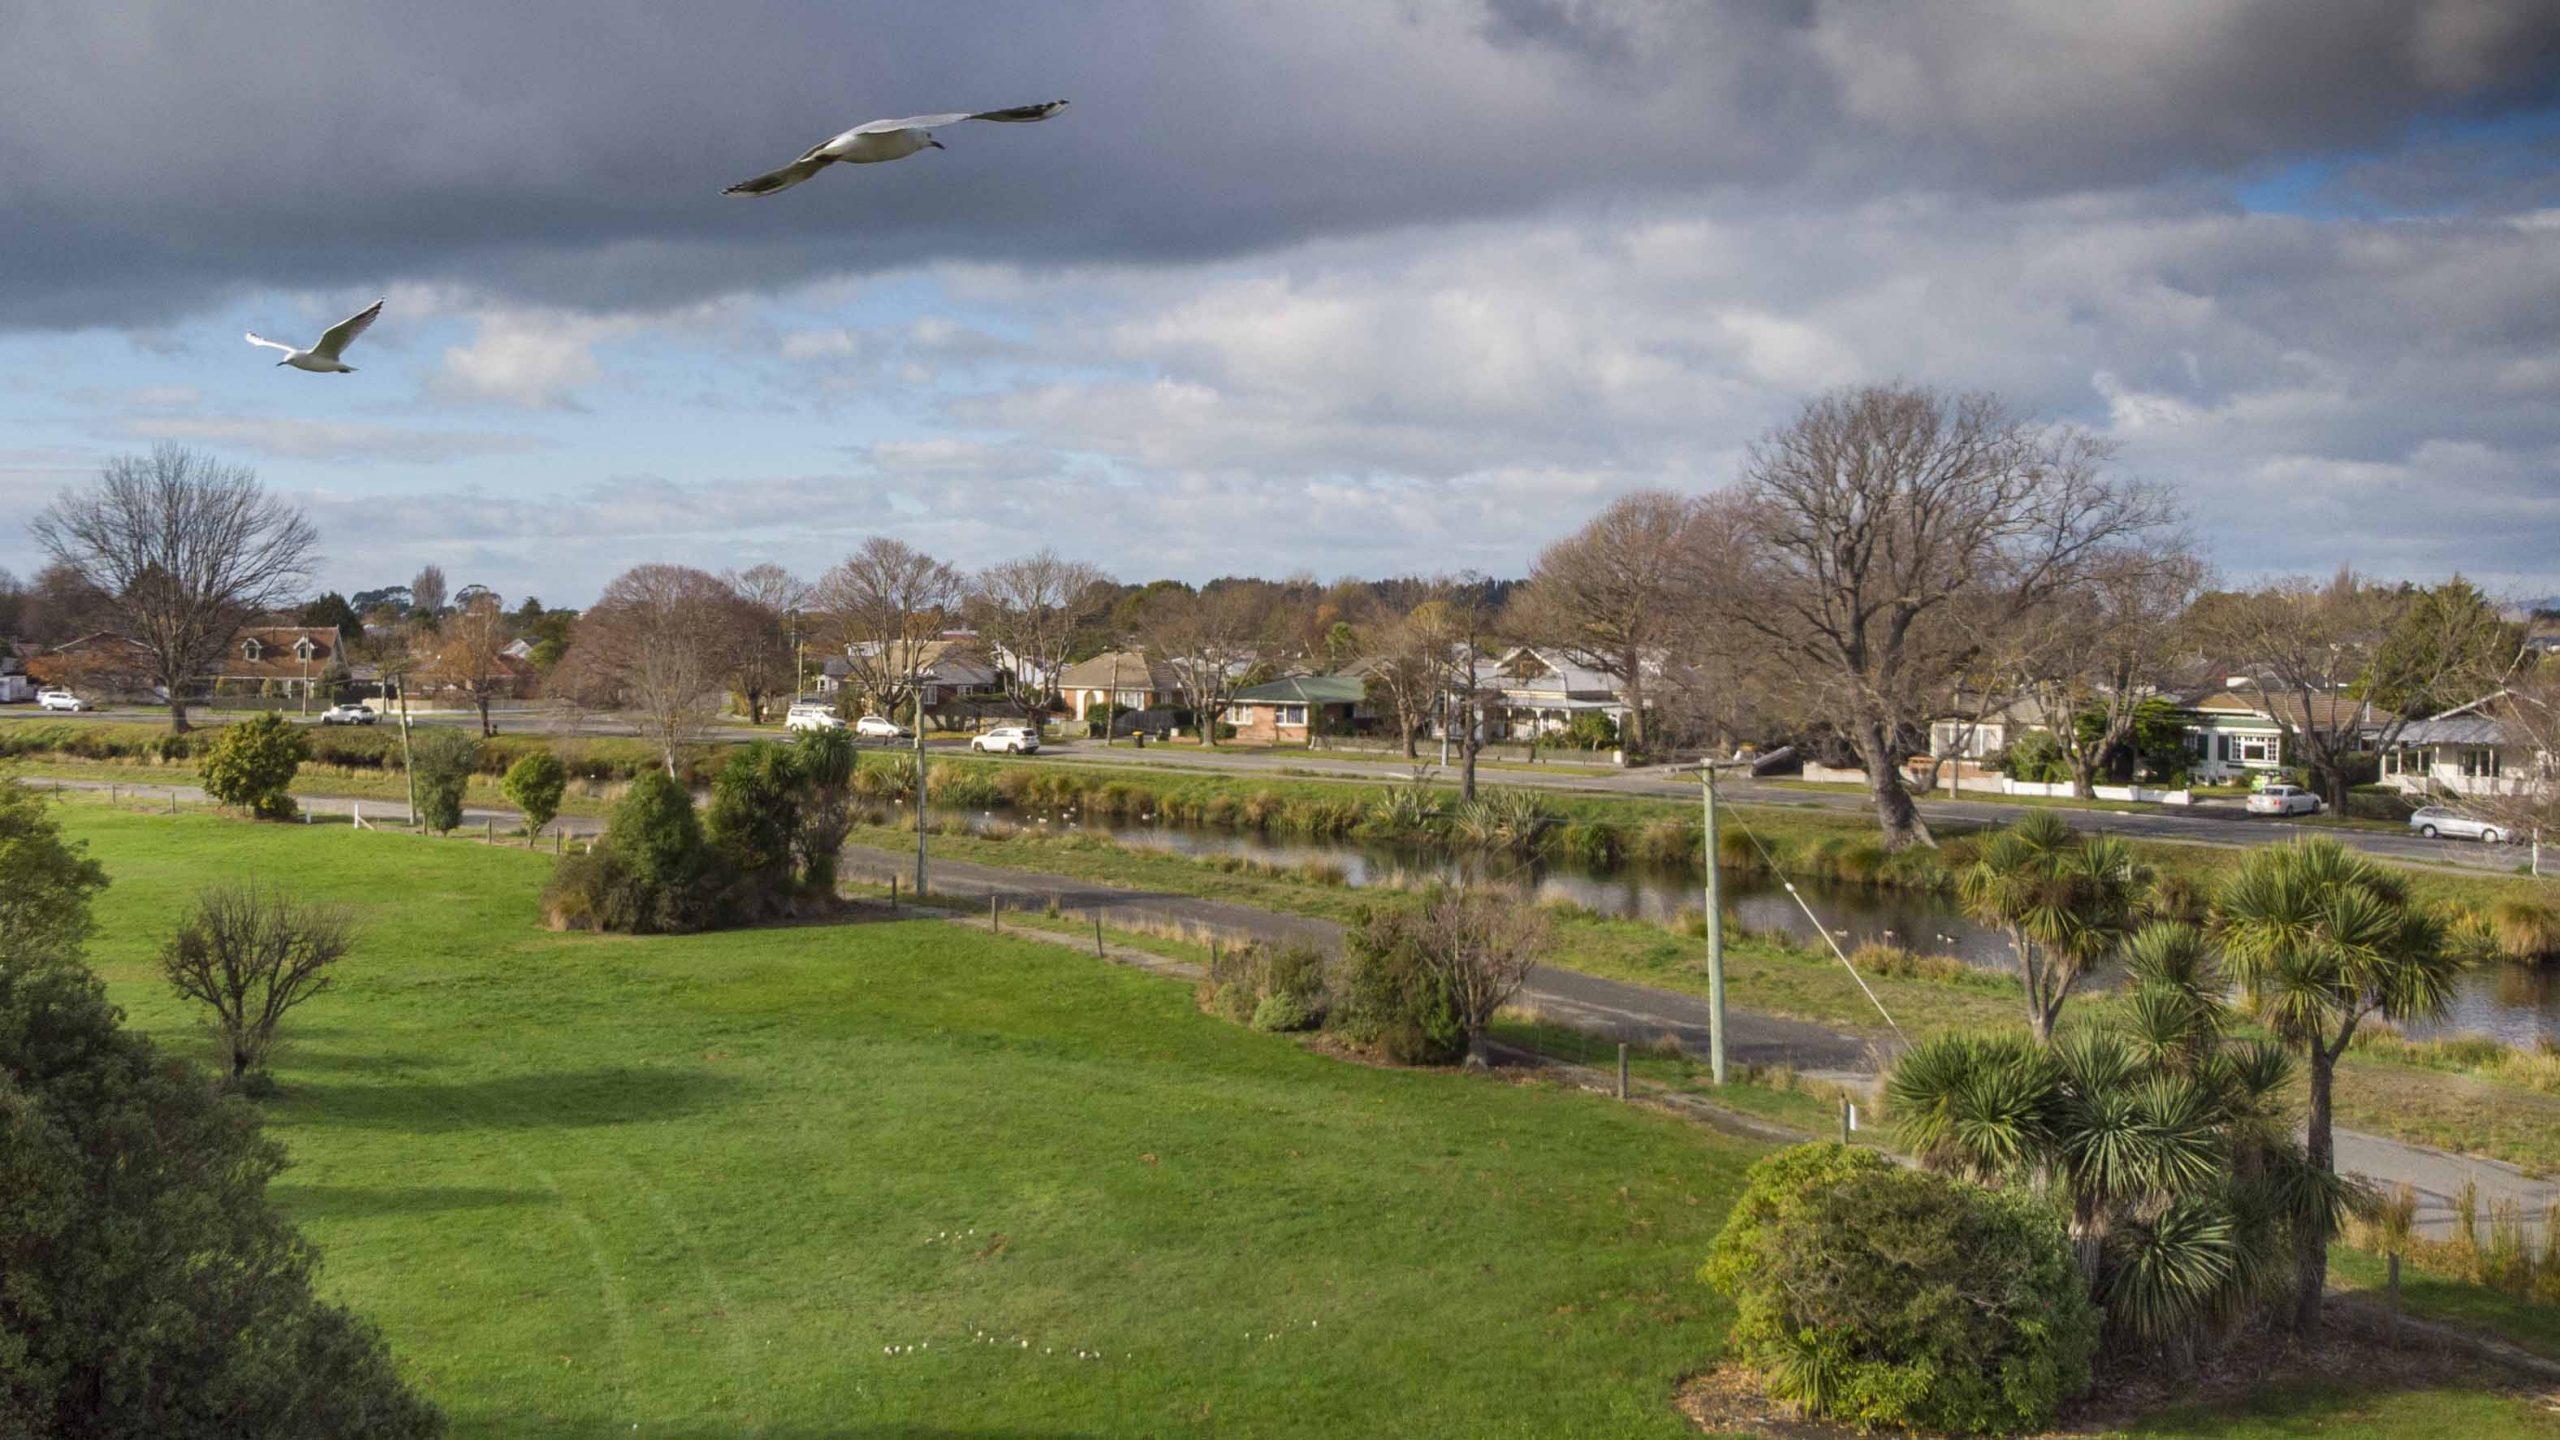 Feedback wanted on new riverside landing and bridges